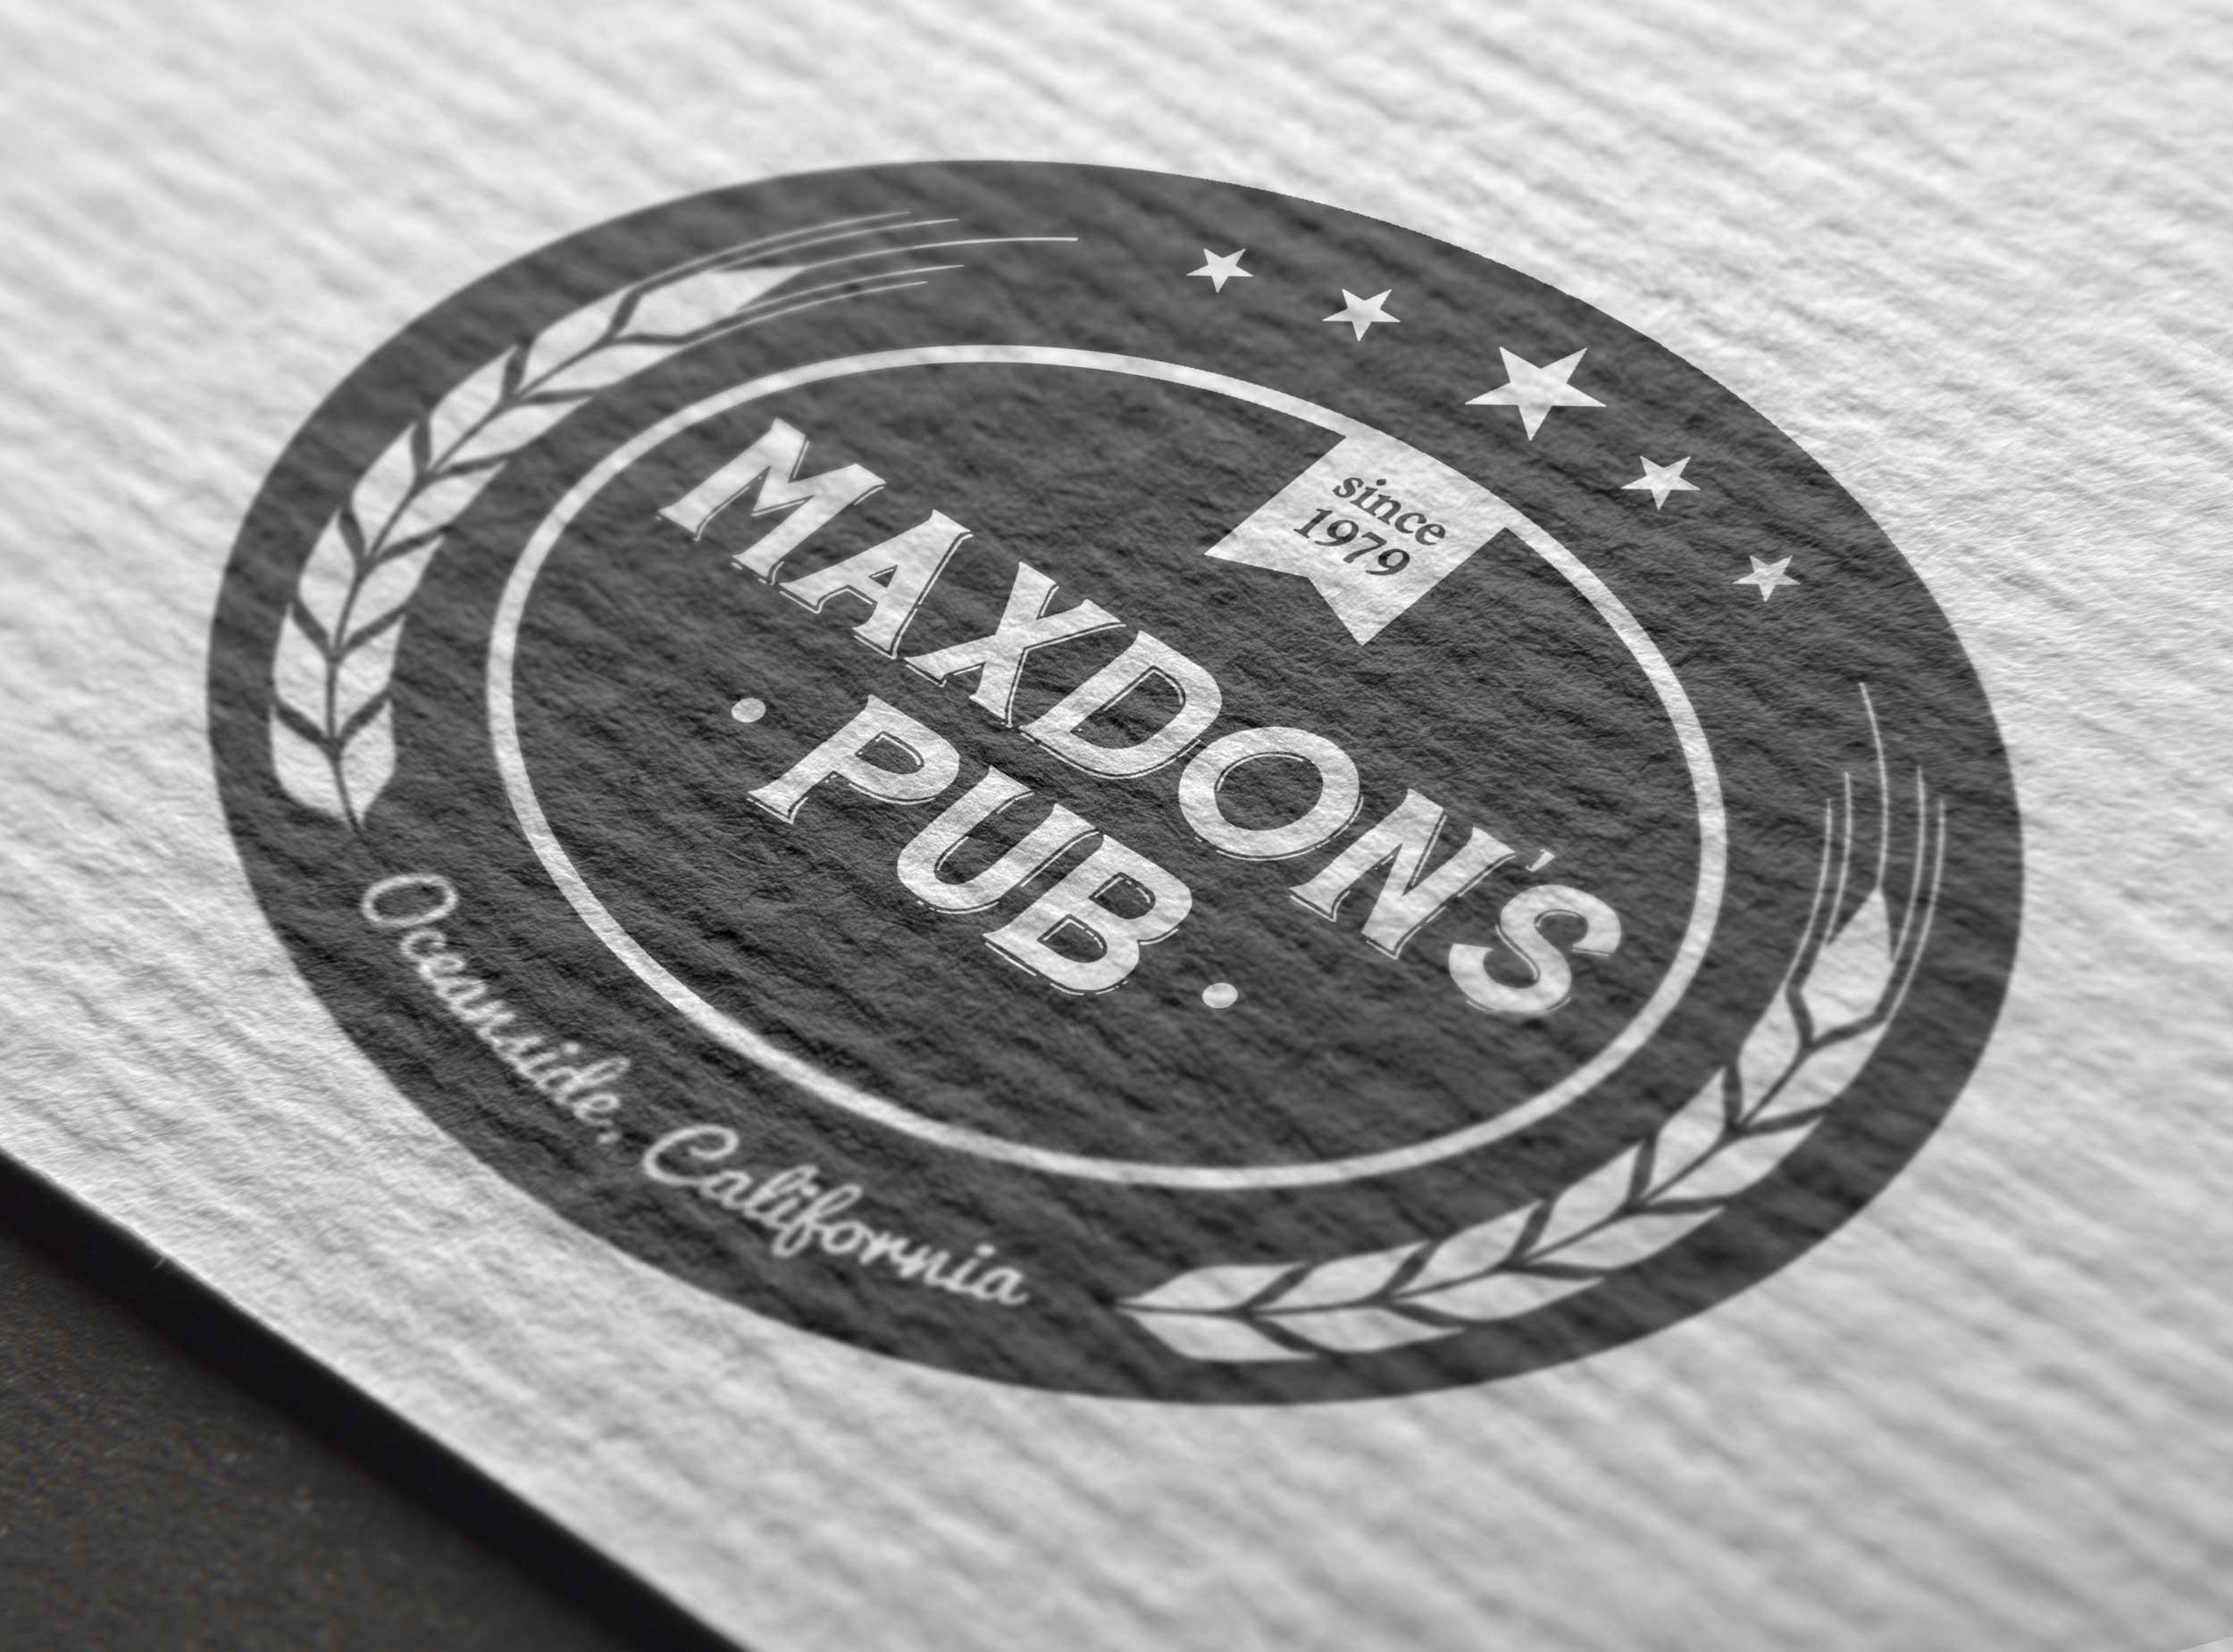 Maxdon's Pub logo on a business card.